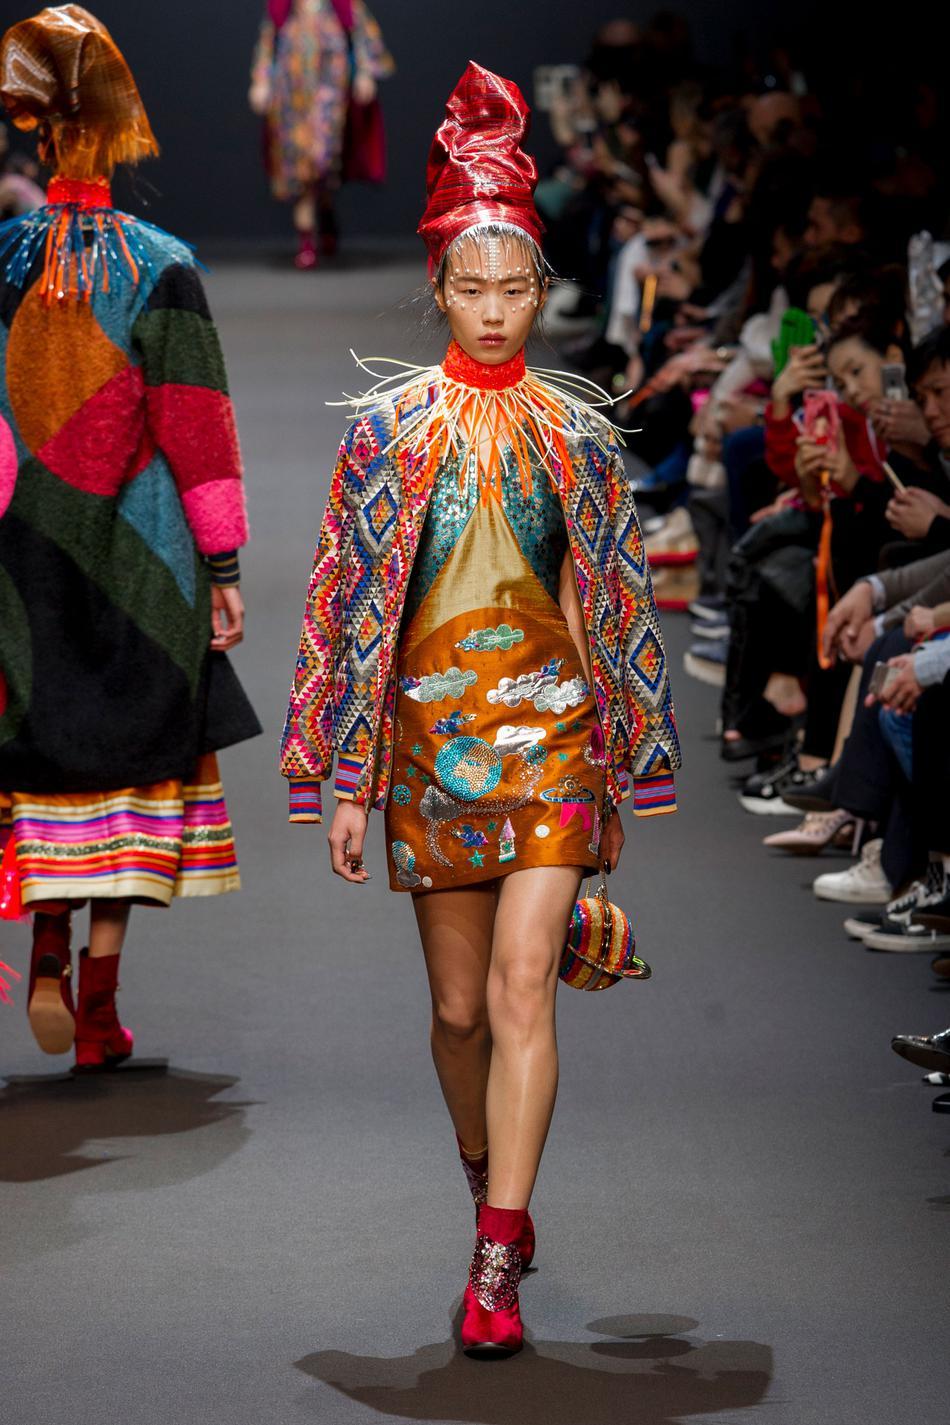 Défilé Manish Arora Fashion Week 2017 - Look 14